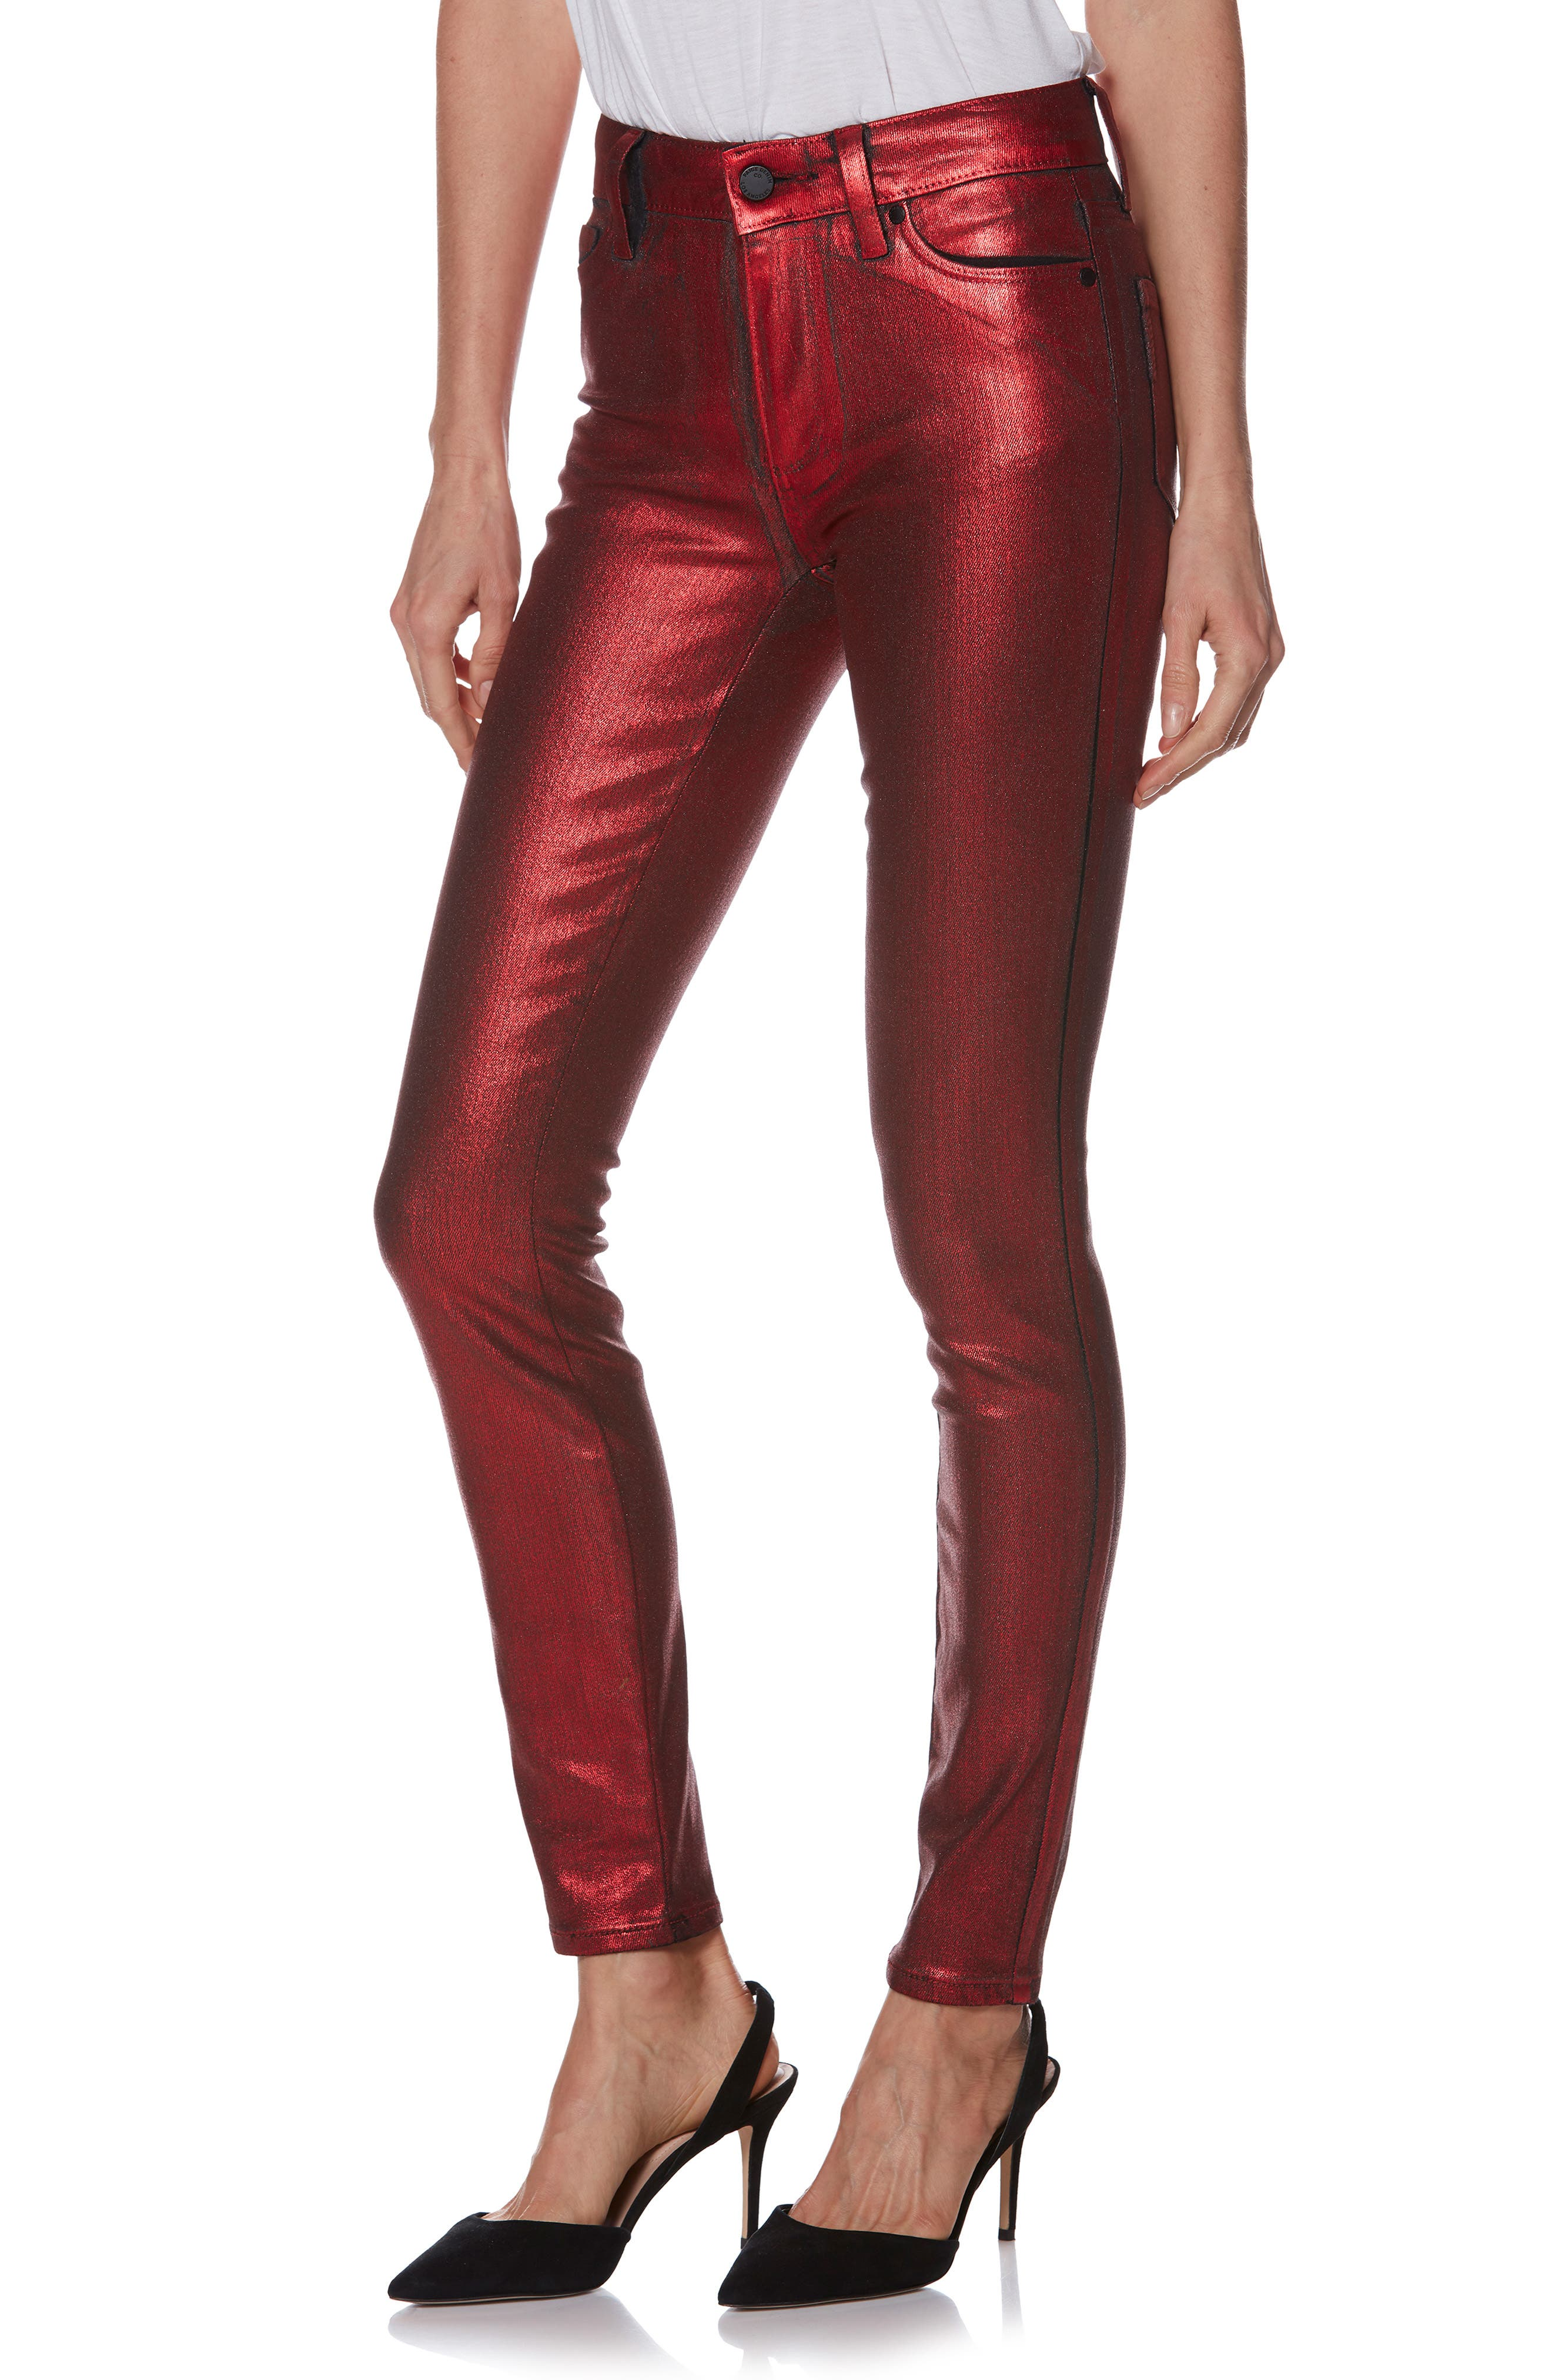 Hoxton High Waist Ultra Skinny Jeans,                             Main thumbnail 1, color,                             RED GALAXY COATING